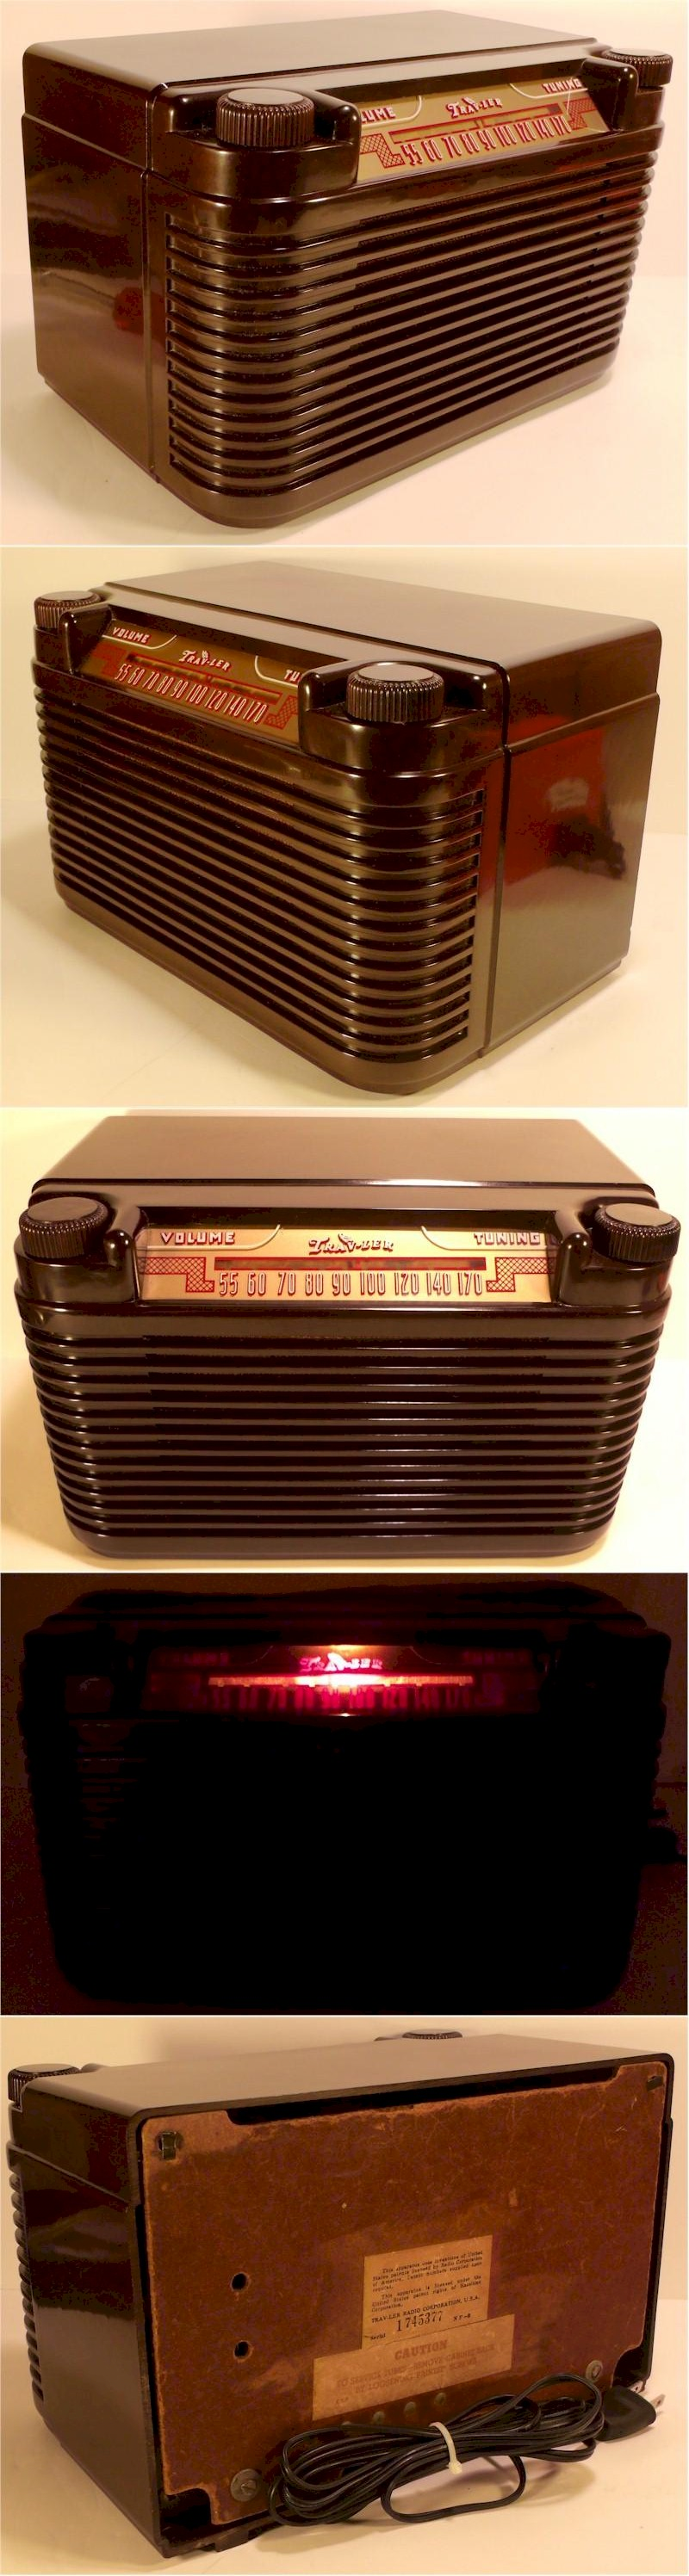 90 0412103 besides 331836035307 in addition Radio besides 111832535763 together with Travler. on trav ler radio